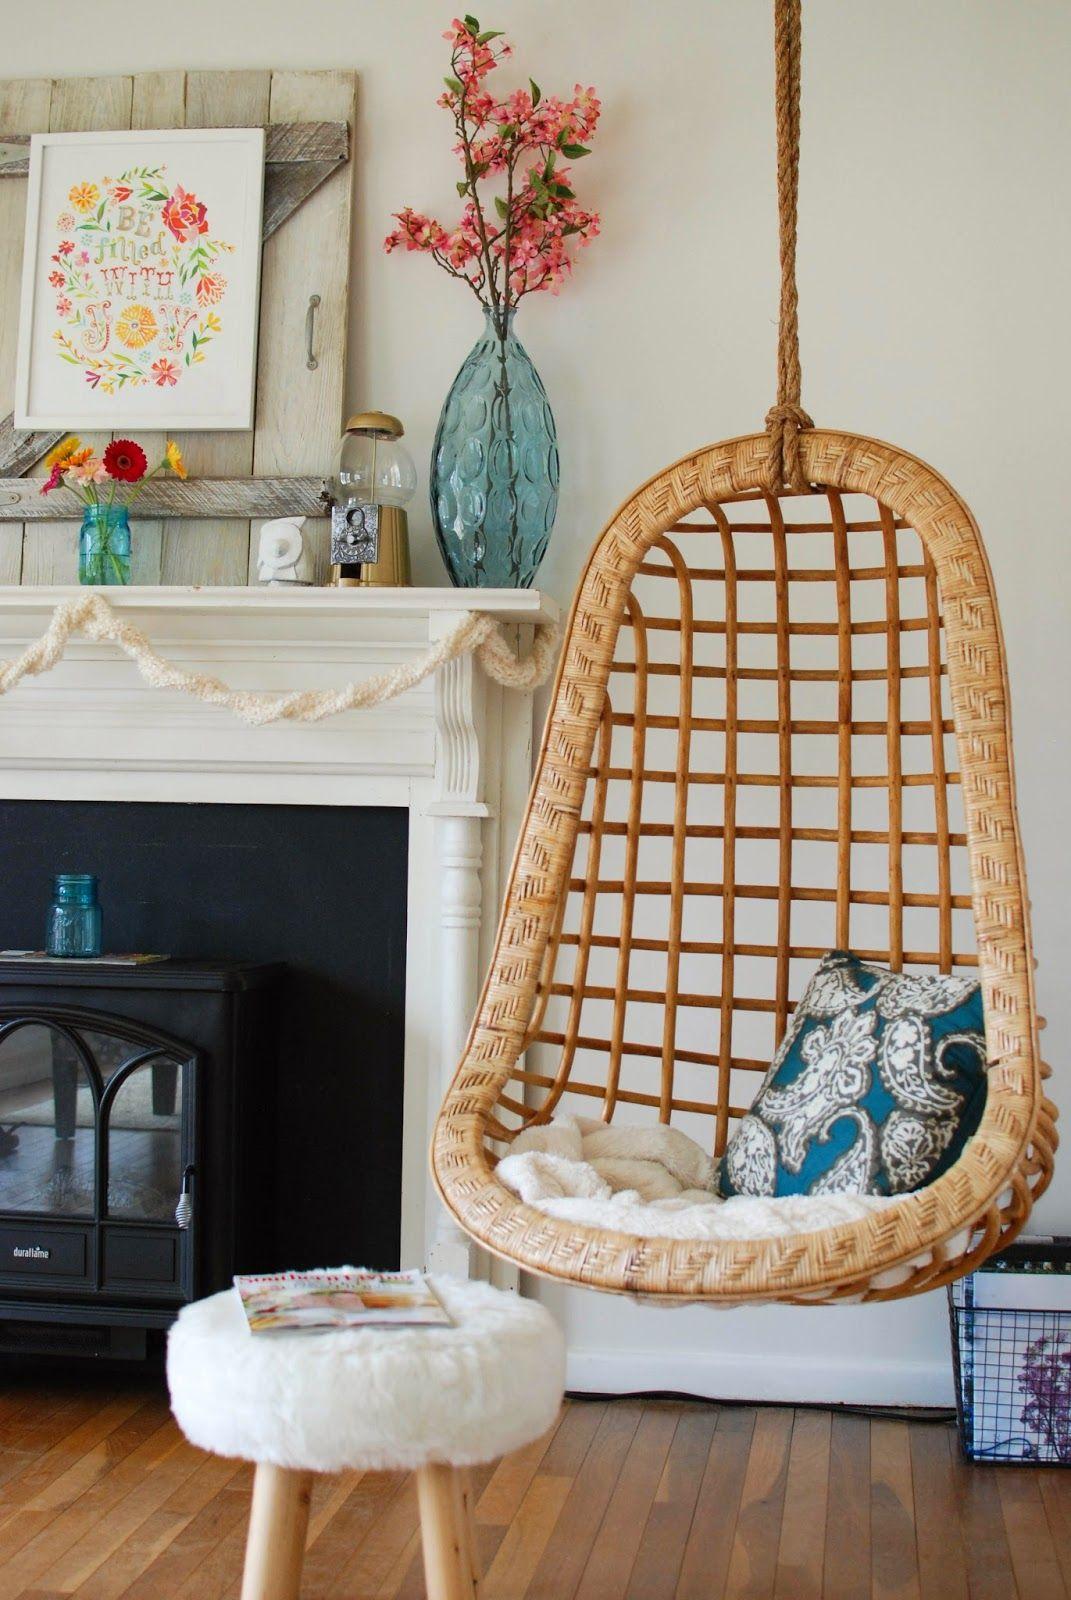 Hangstoel in de woonkamer   Interieur blog   Pinterest - Hangstoel ...